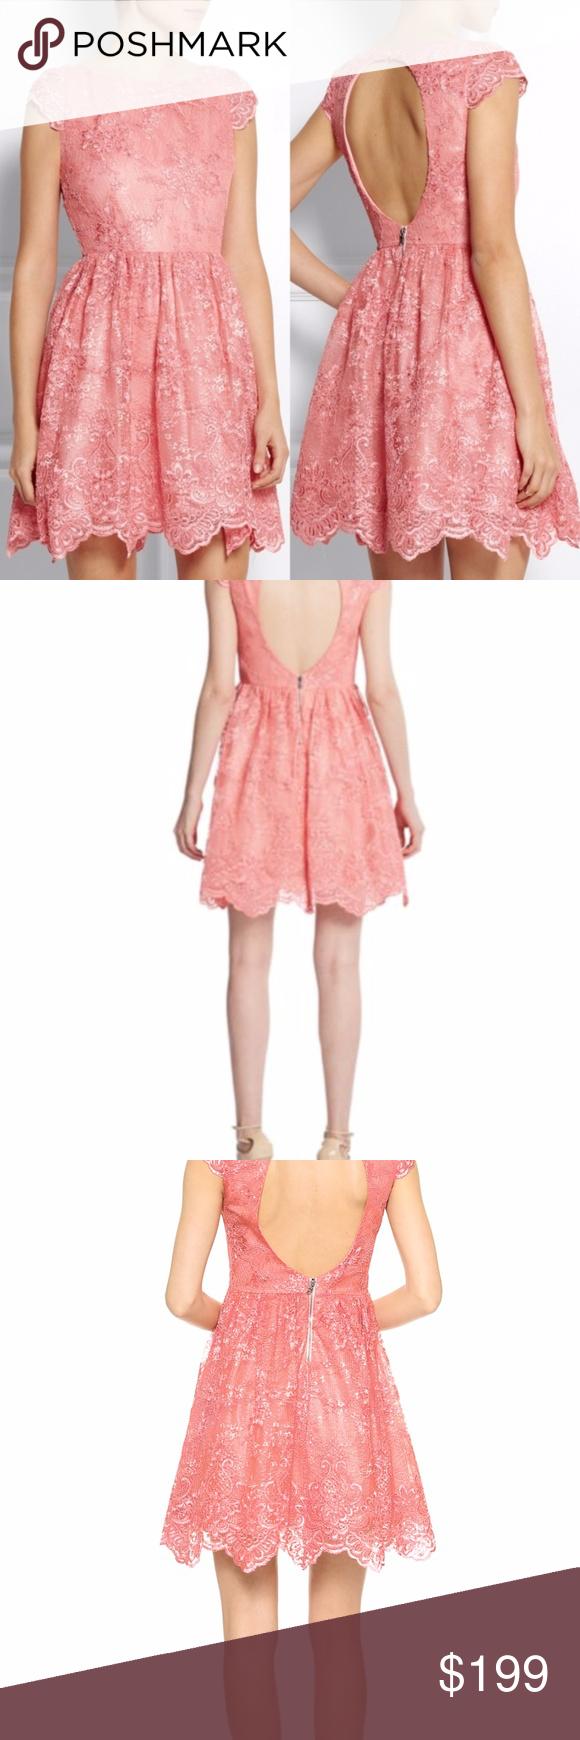 Alice + Olivia Scalloped Lace Open Back Dress